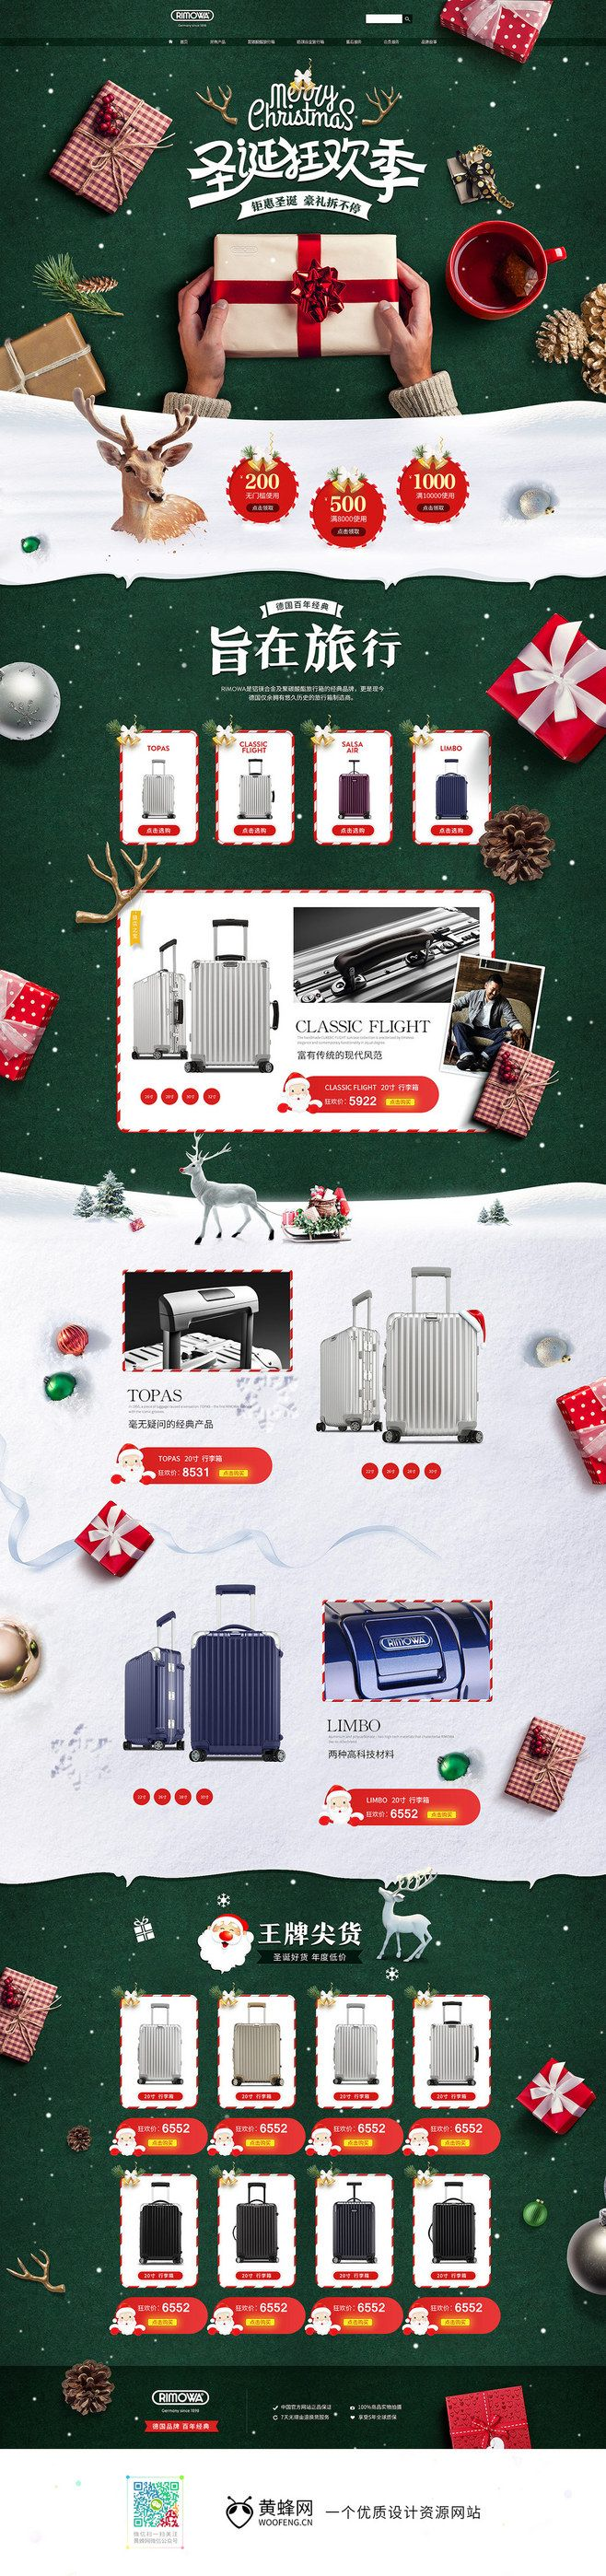 rimowa箱包圣诞节天猫首页活动专题页...